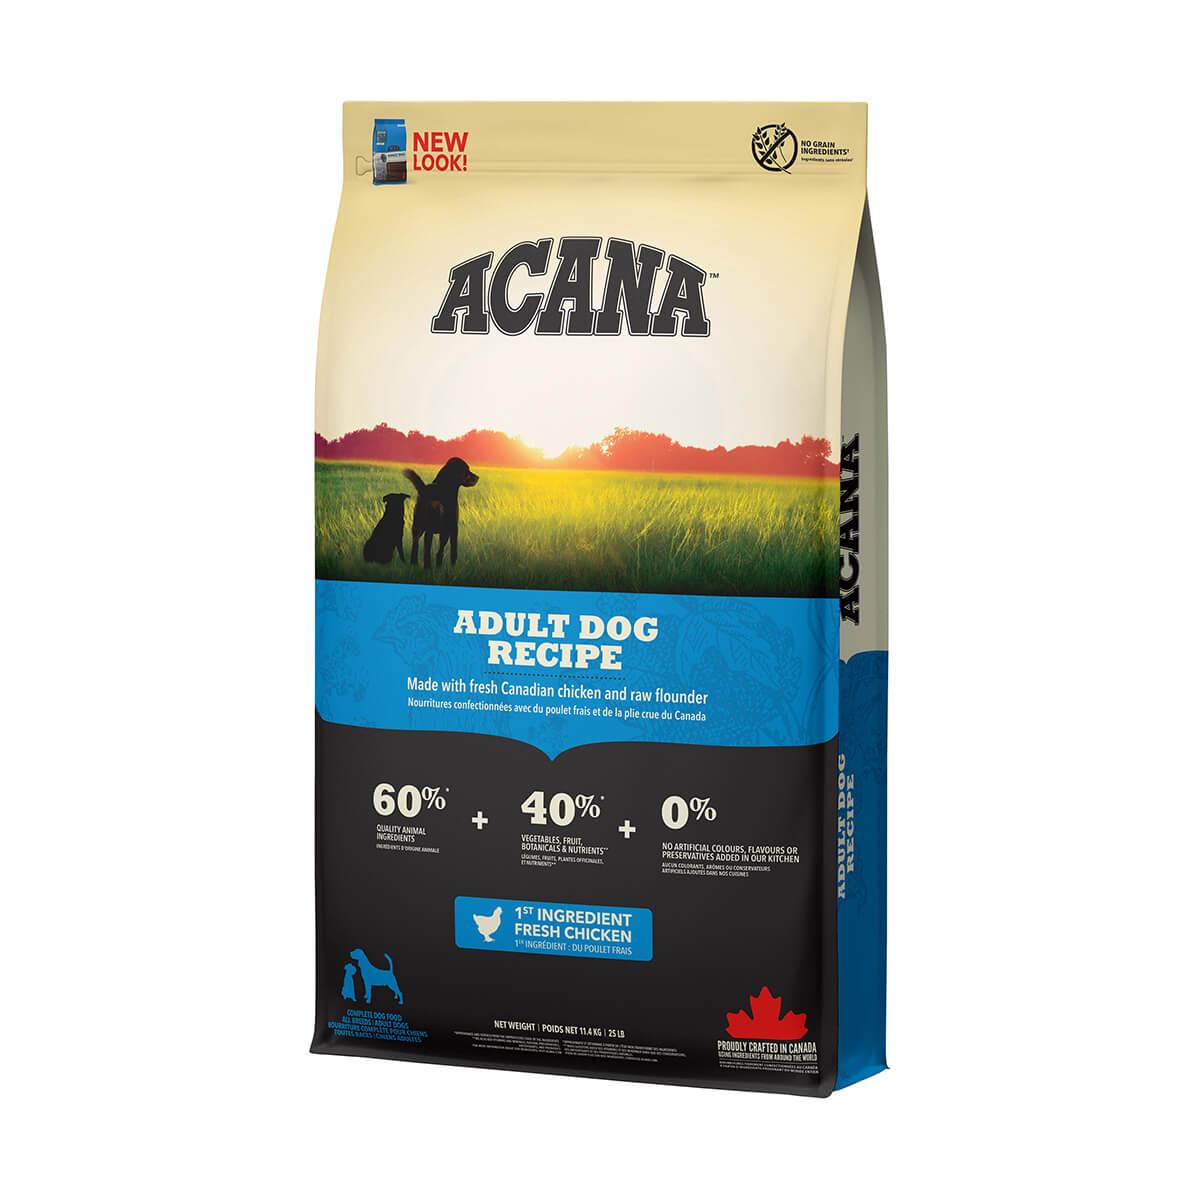 ACANA ADULT DOG FOOD - 11.4 KG